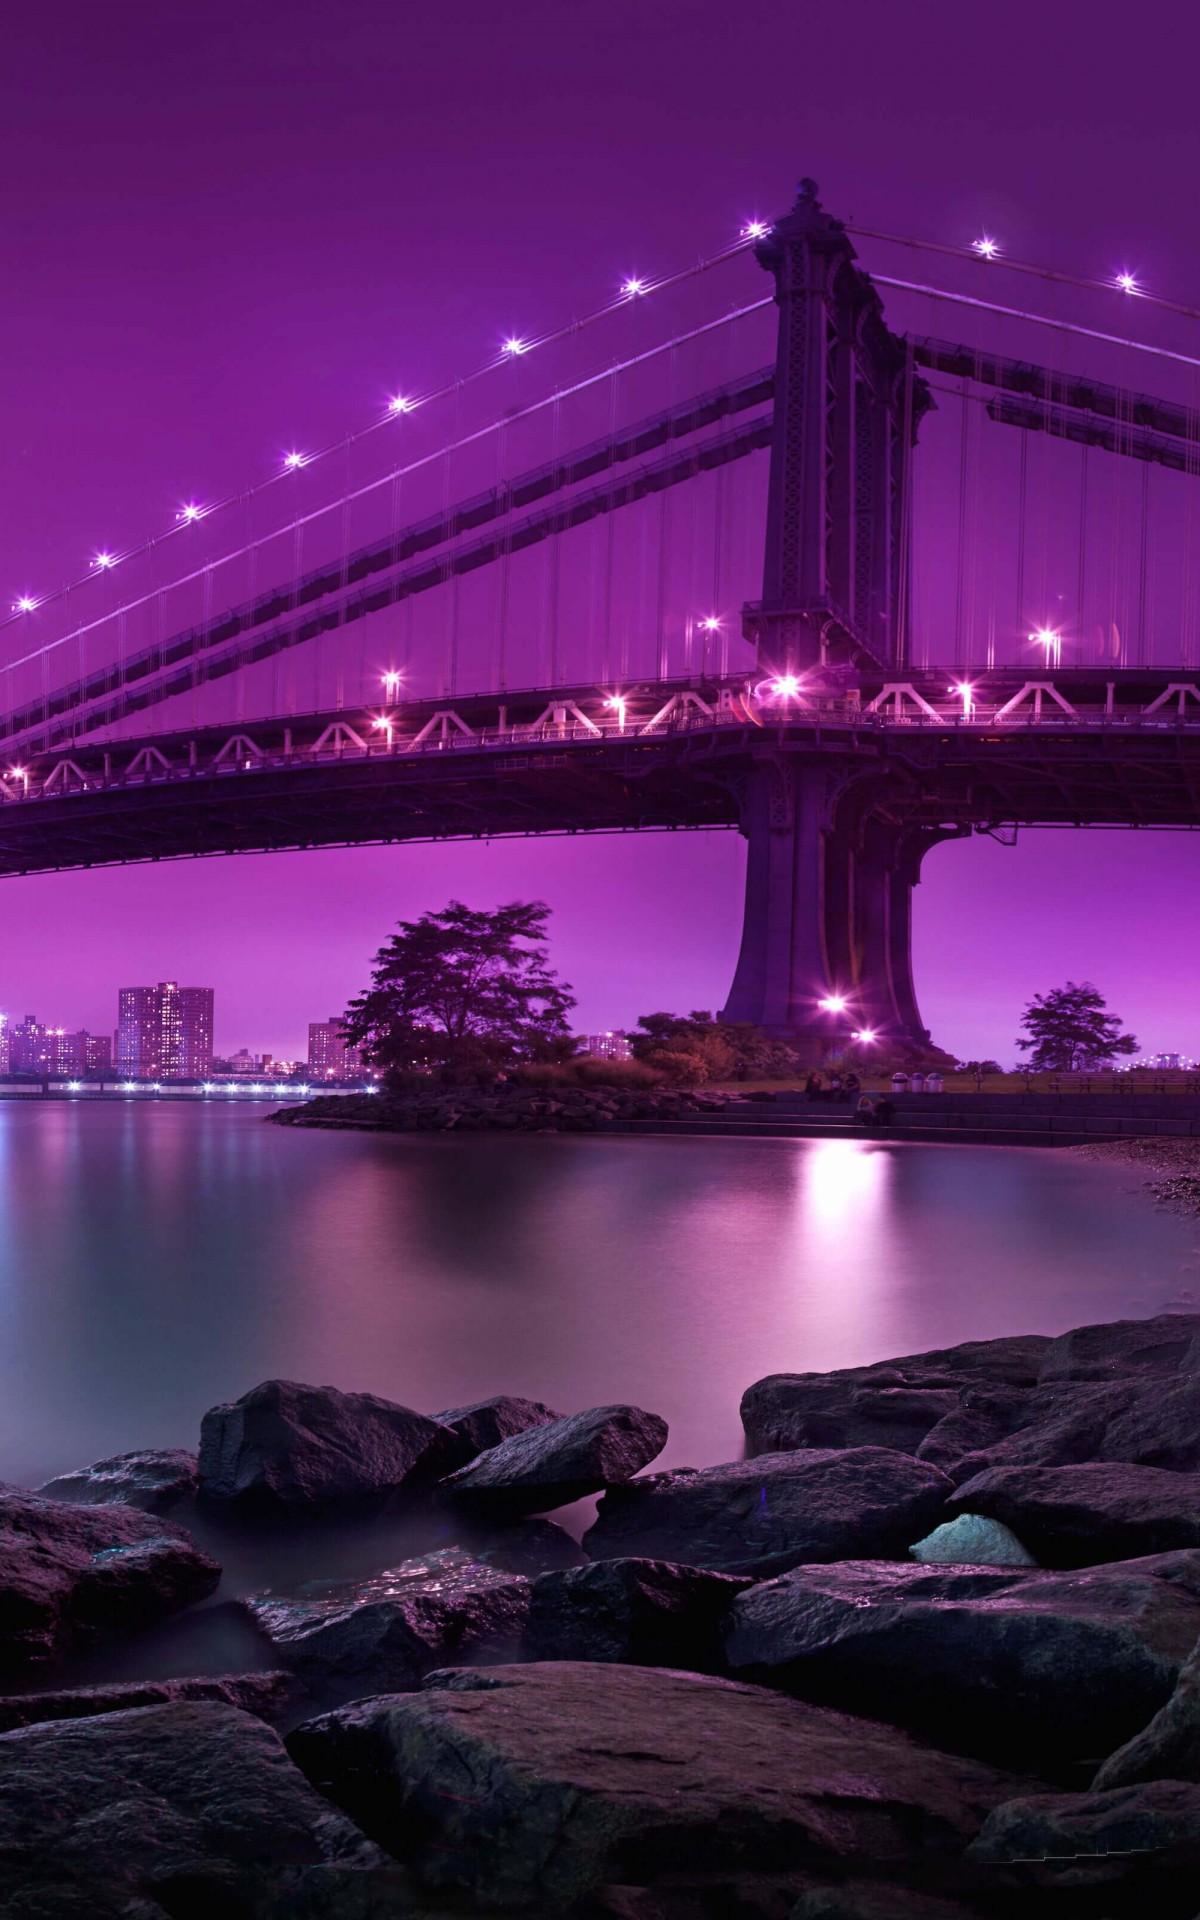 Bridge by night HD wallpaper for Kindle Fire HDX   HDwallpapersnet 1200x1920